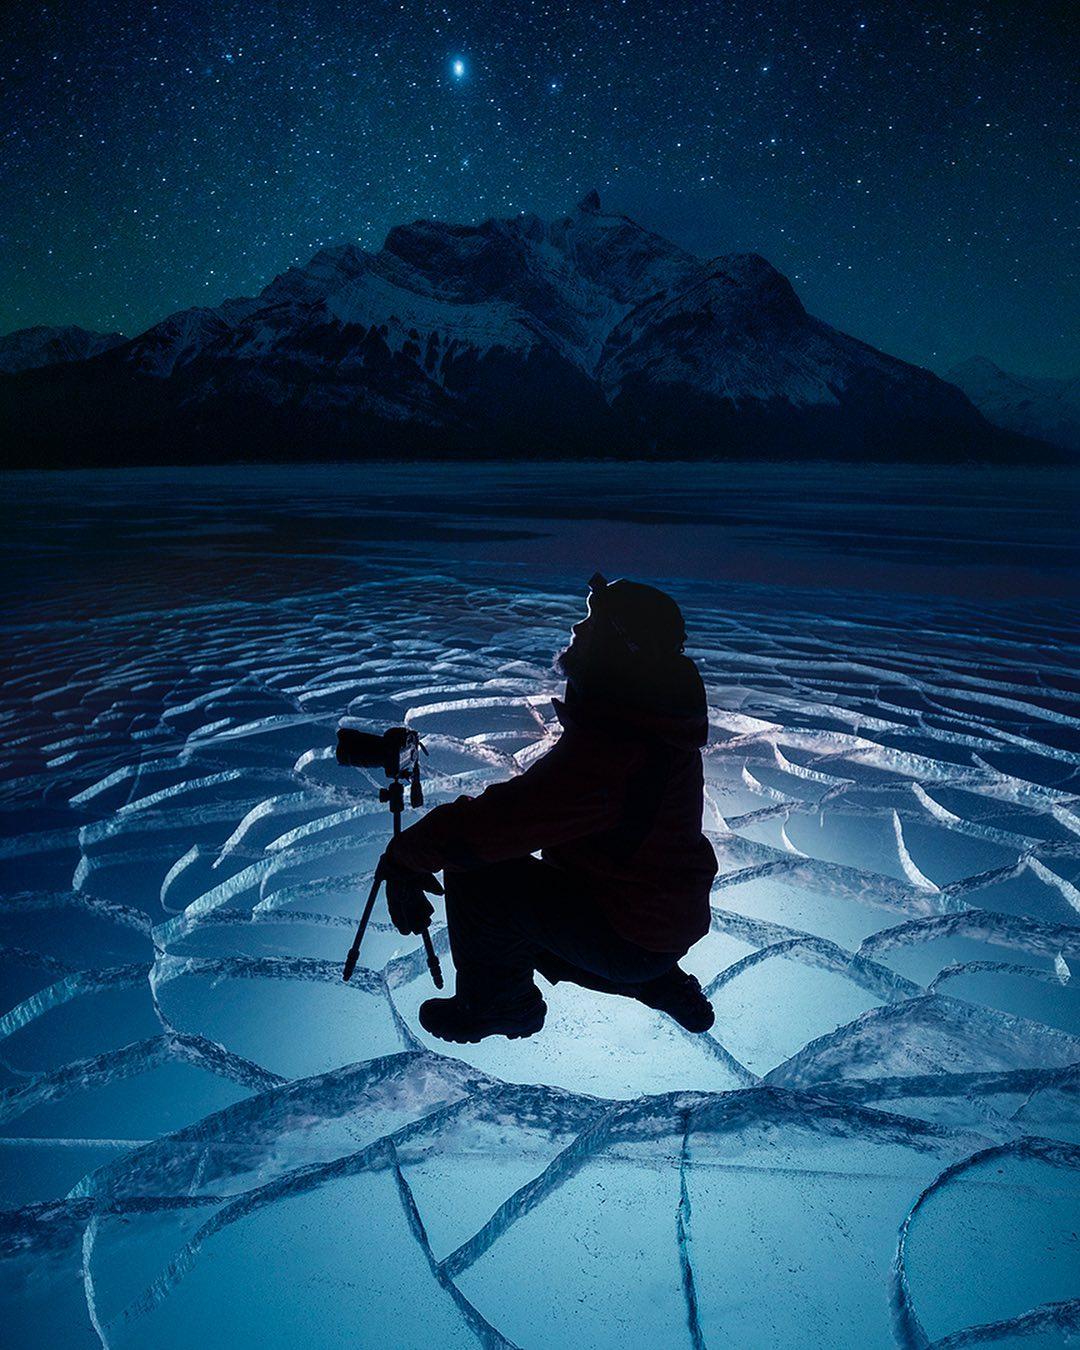 man kneeling on cracked iced over lake